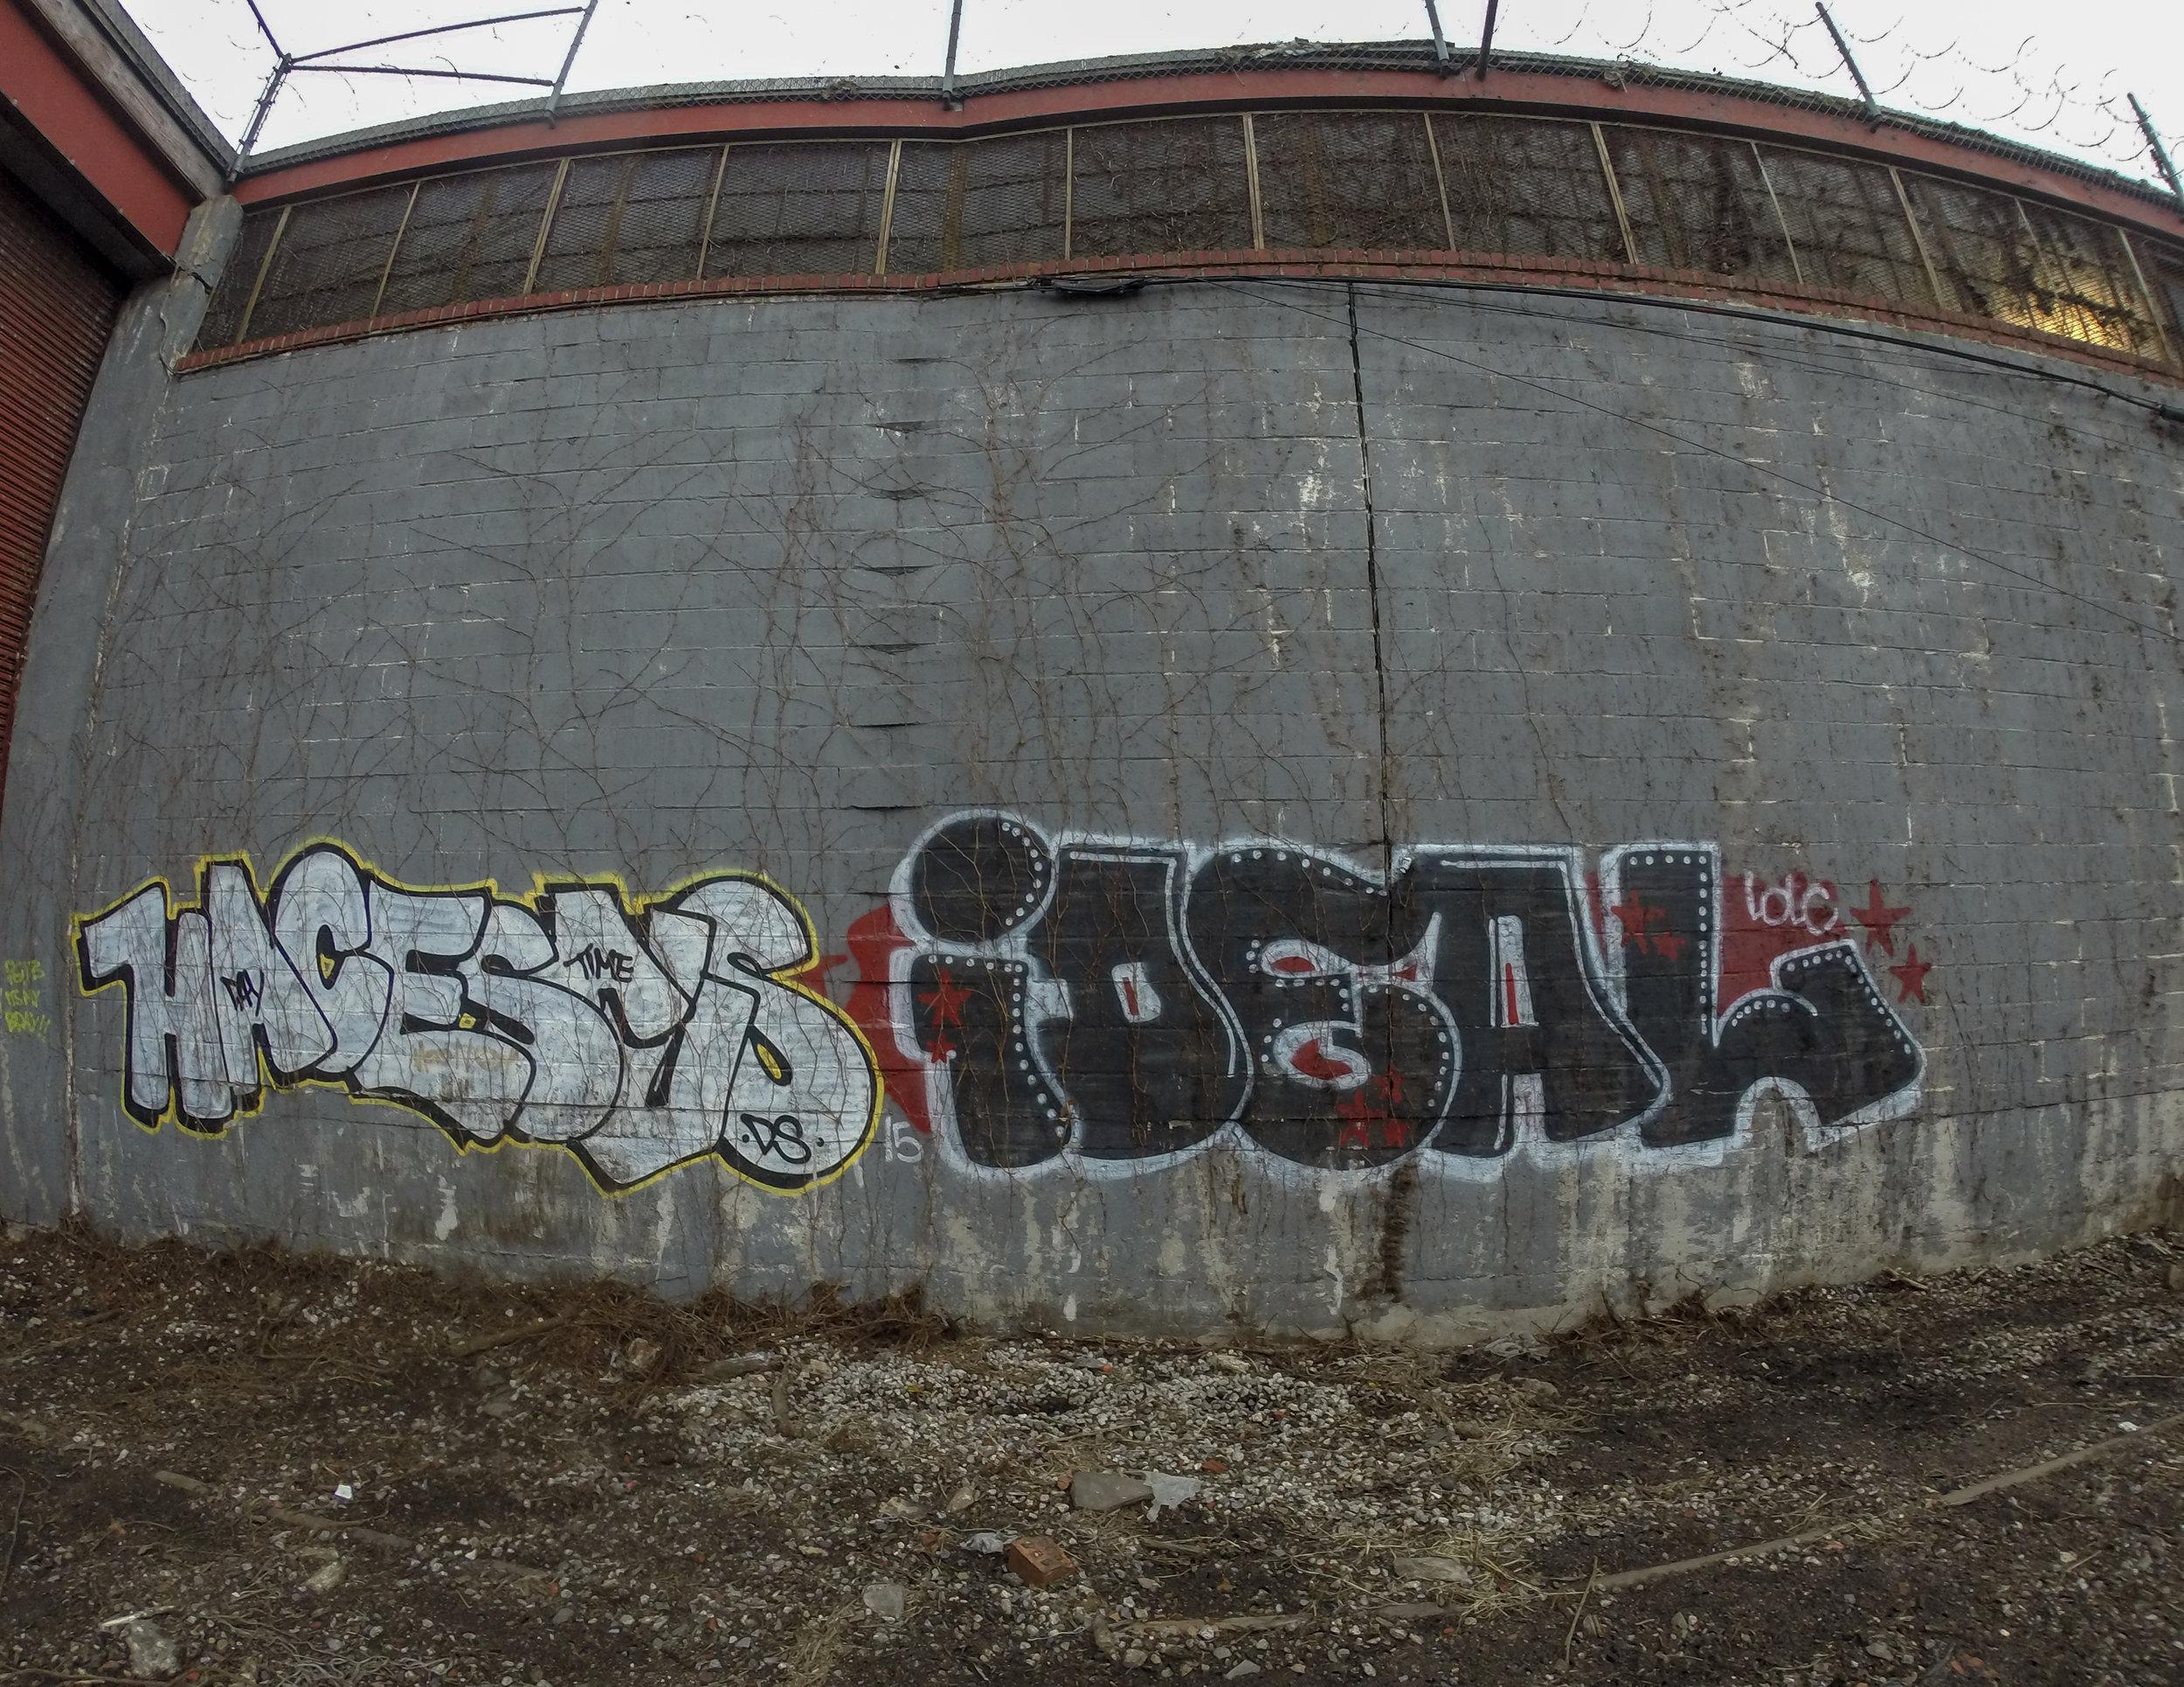 hacesus ideal elevated locals lic.jpg